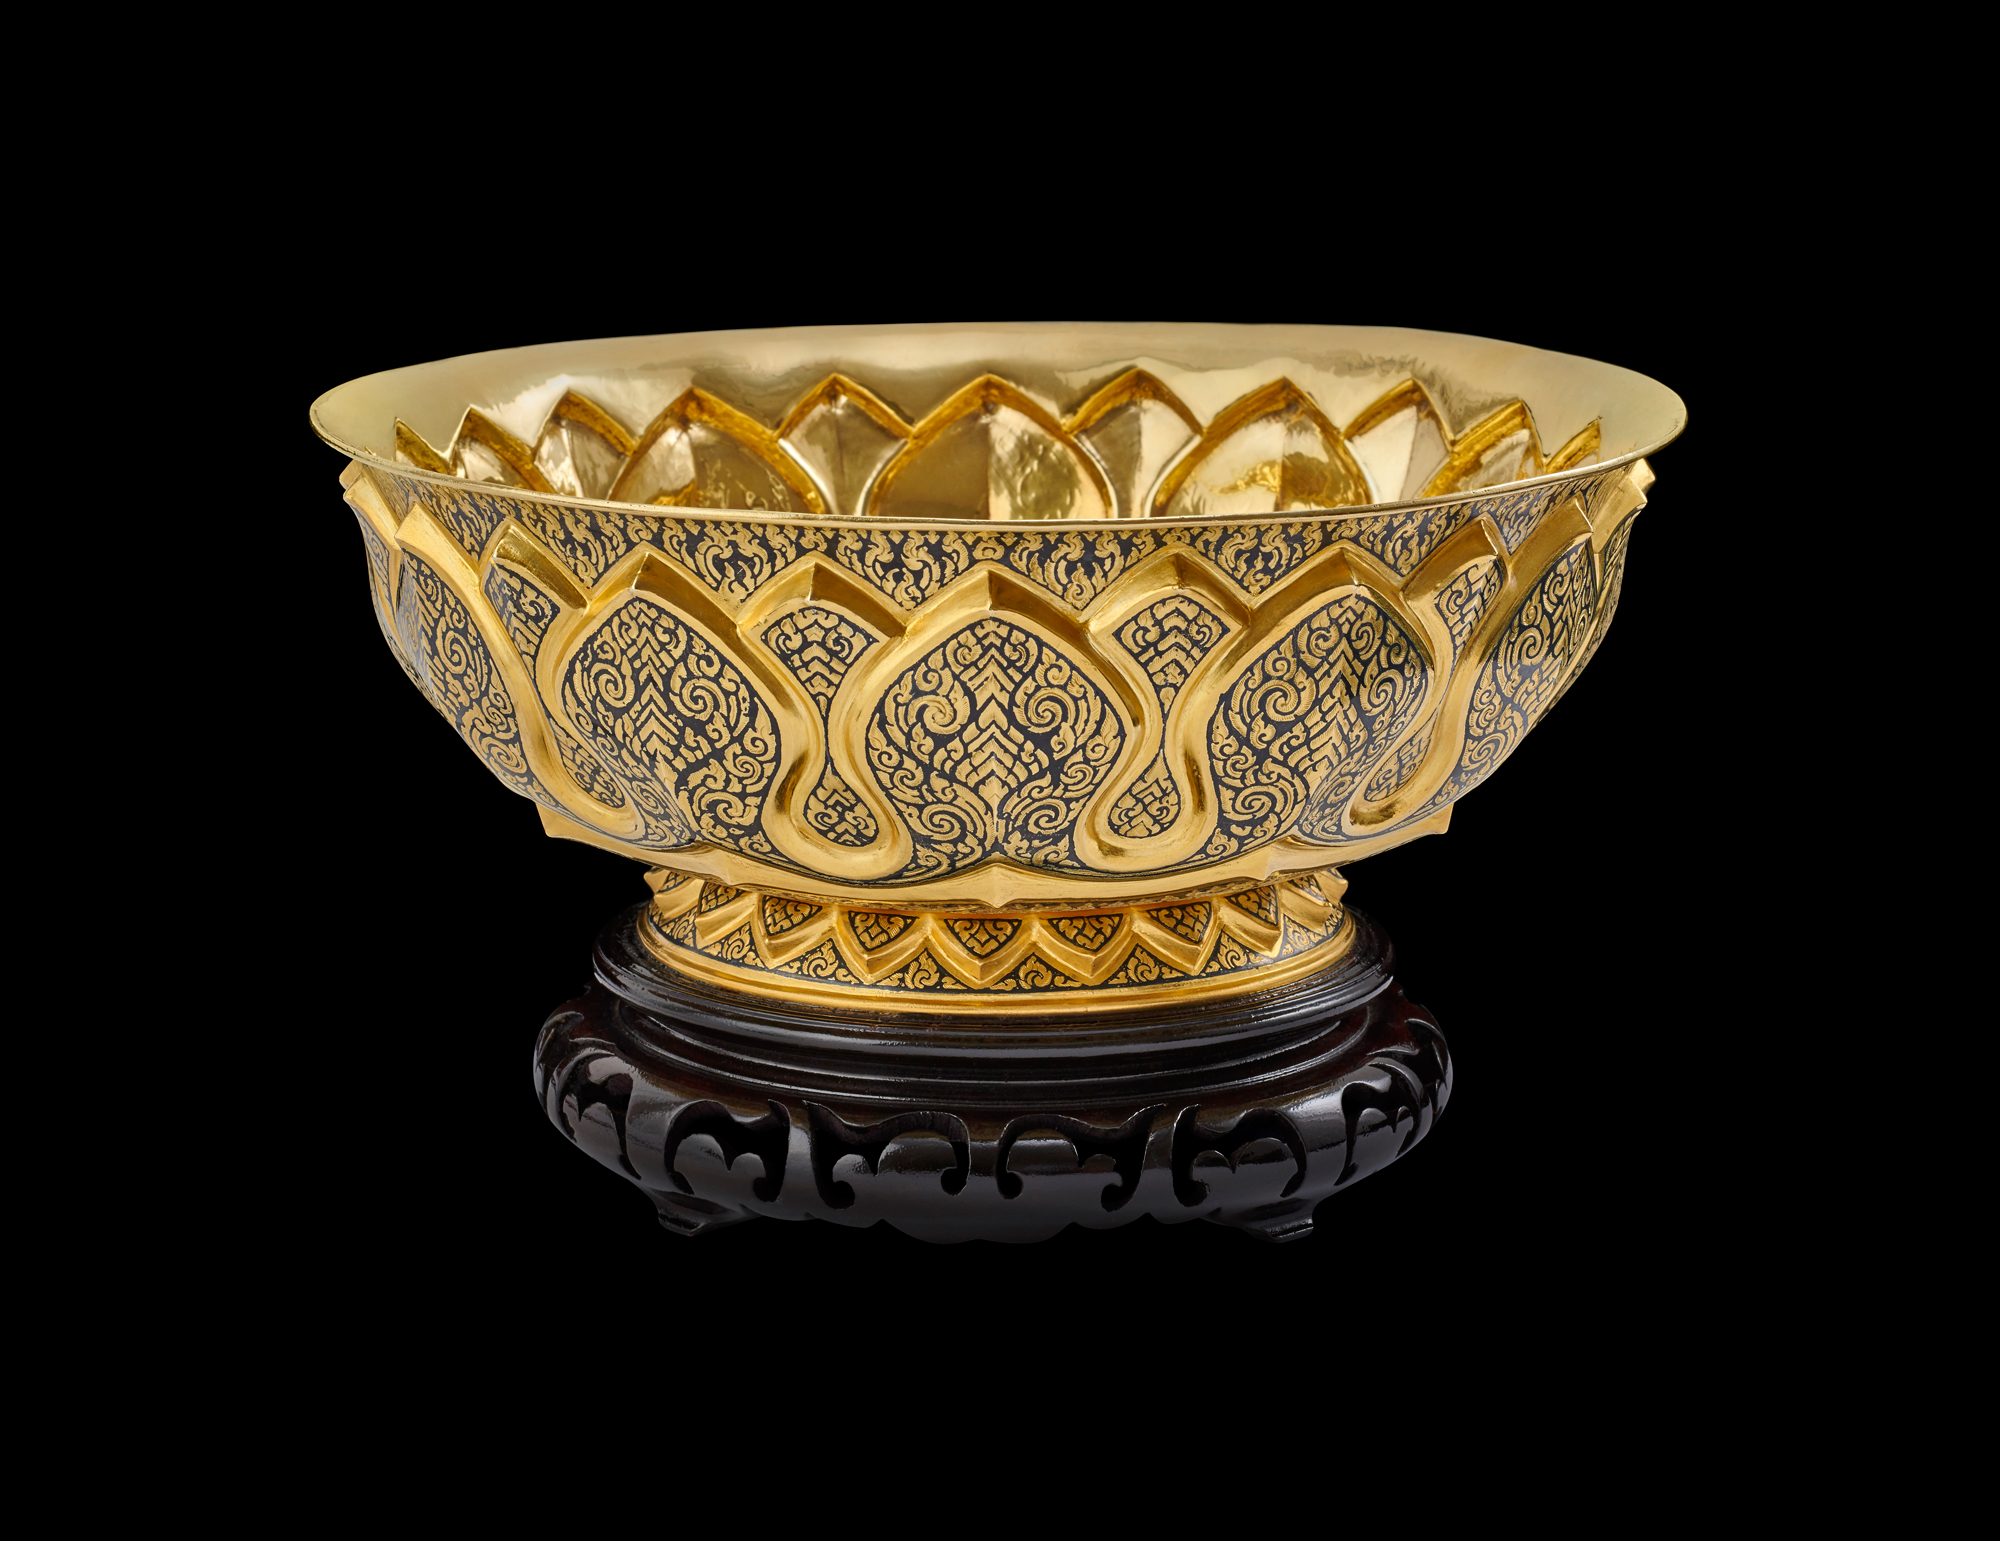 "Gold Niello Bowl Gift from King Bhumibol Adulyadej to First Lady Claudia ""Lady Bird"" Johnson, 1967 14.29 x 25.72 cm Courtesy of the Lyndon B. Johnson Presidential Library and Museum; 1967.38.3  พานถมทอง ของขวัญพระราชทานจากพระบาทสมเด็จพระปรมินทรมหาภูมิพลอดุลยเดช แก่นางคลอเดีย ""เลดี เบิร์ด"" จอห์นสัน สุภาพสตรีหมายเลขหนึ่ง พ.ศ. ๒๕๑๐ ๑๔.๒๙ x ๒๕.๗๒ ซม. ได้รับความอนุเคราะห์จากพิพิธภัณฑ์และหอสมุดประธานาธิบดีลินดอน บี. จอห์นสัน; 1967.38.3"